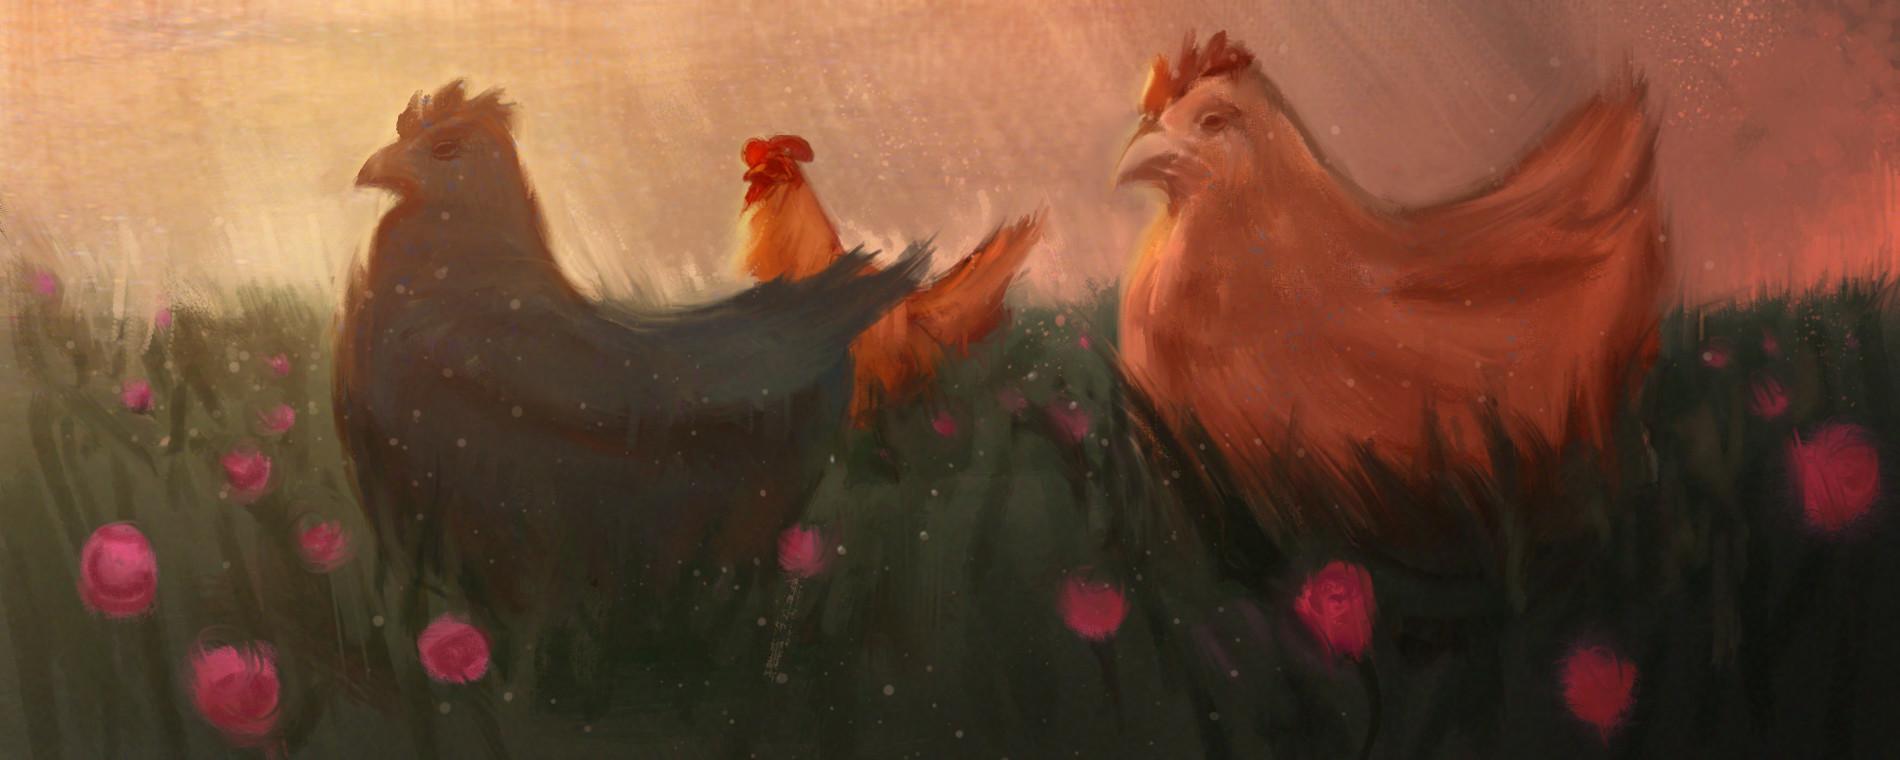 Brian kellum bkellum chickens02 2015